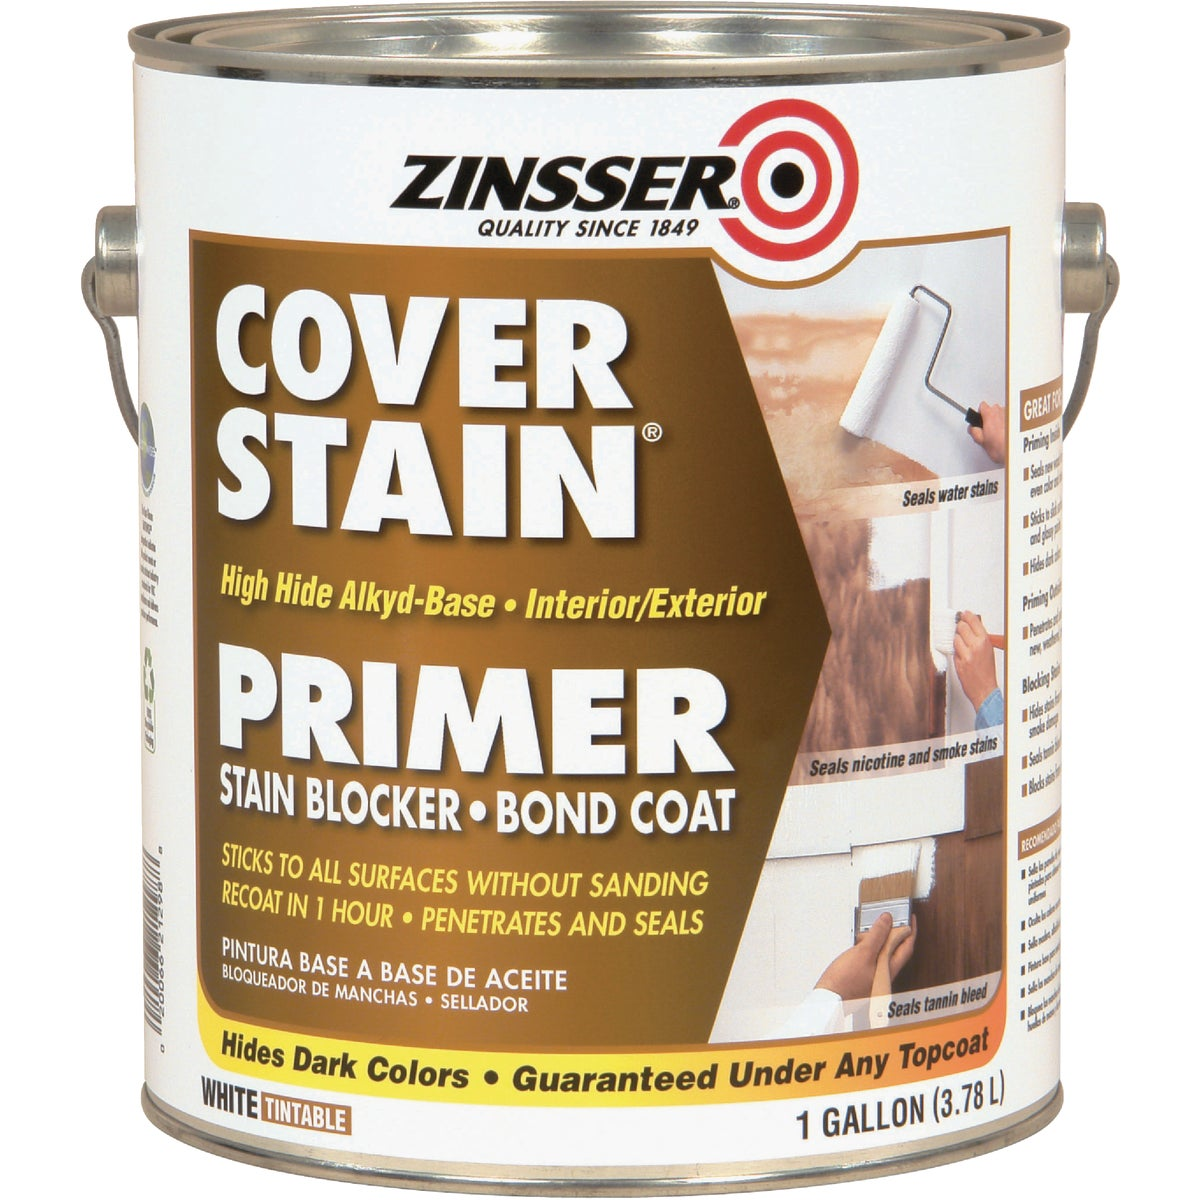 100VOC COVER STN PRIMER - 262765 by Rustoleum